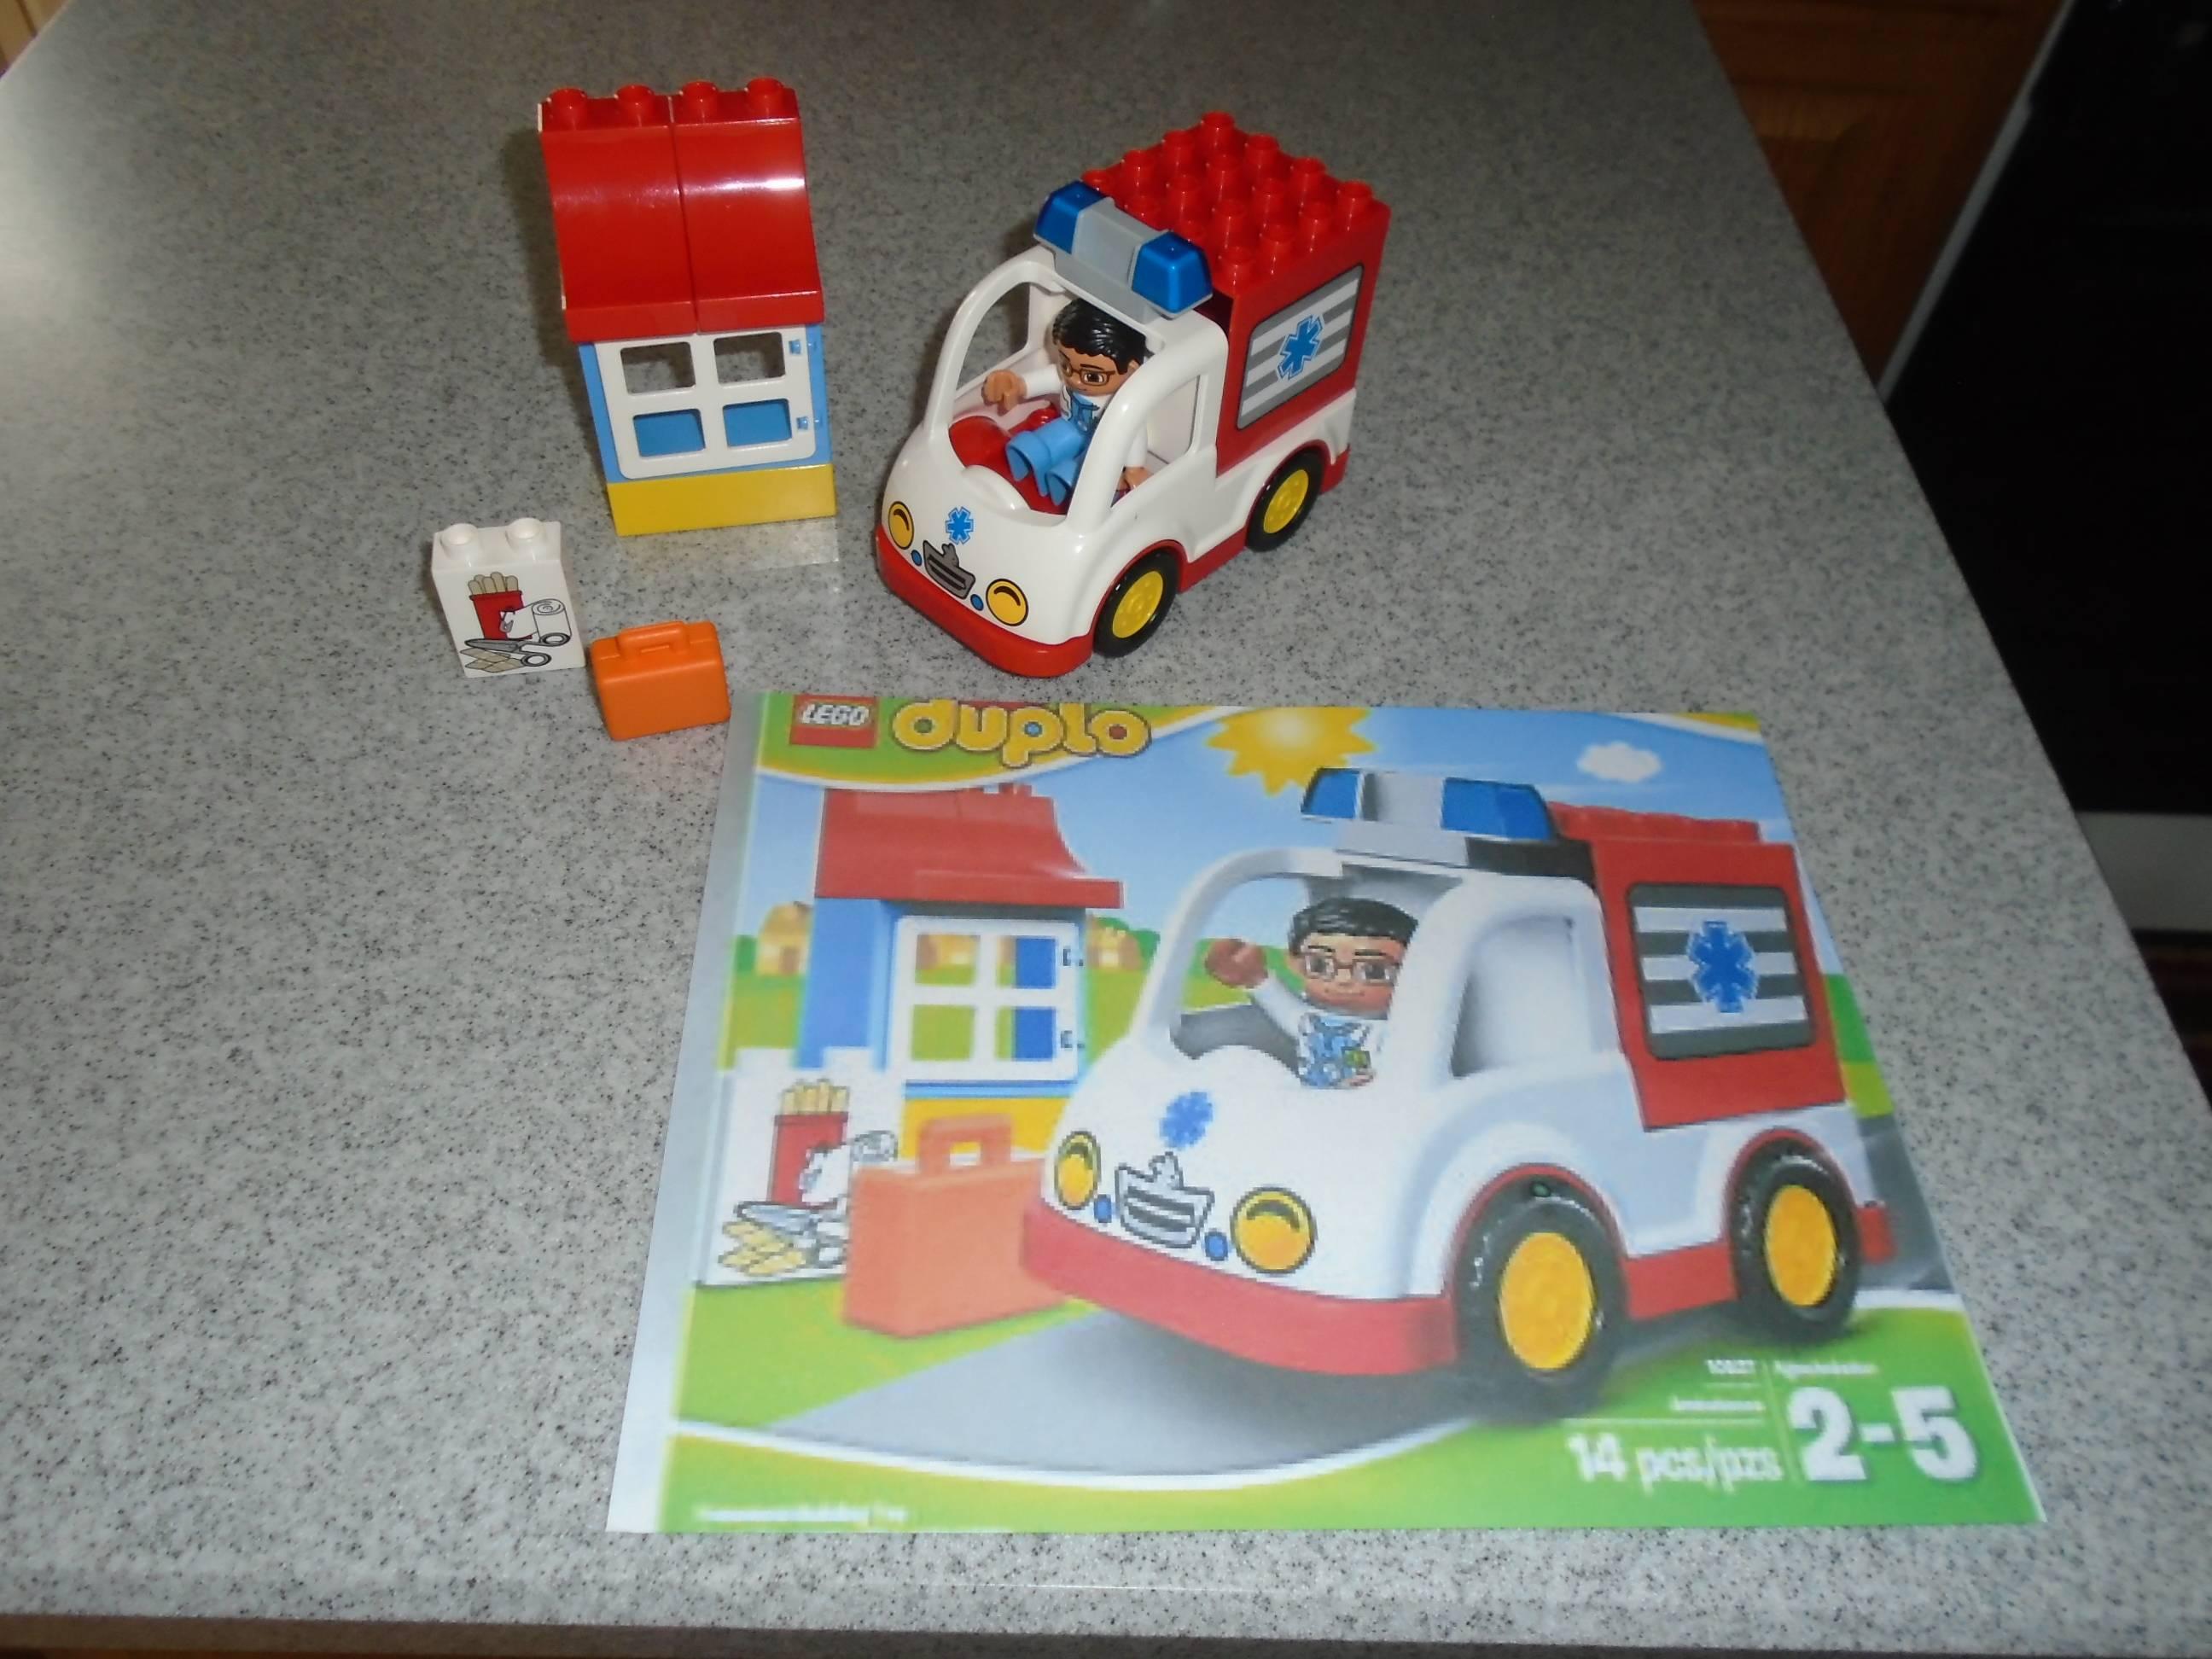 LEGO DUPLO Ville Ambulance 10527 - $15